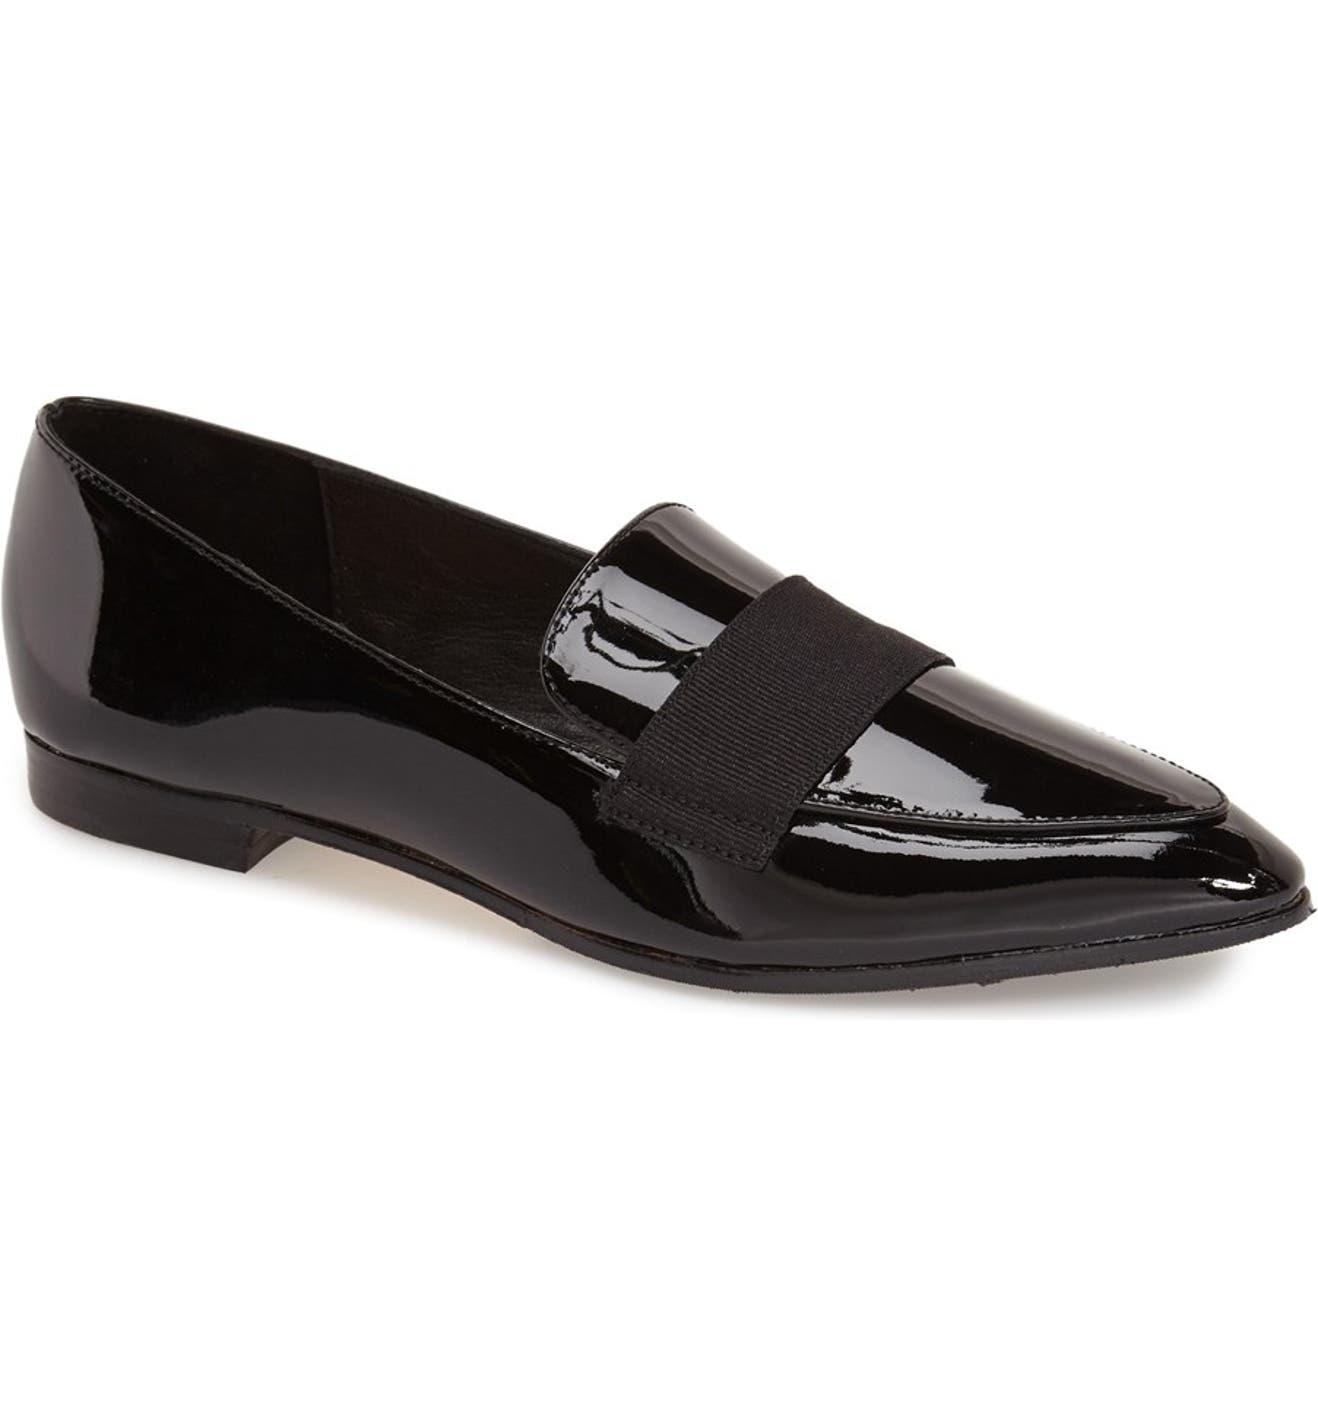 dfb0c0c59b01 kate spade new york  corina  pointy toe loafer (Women)